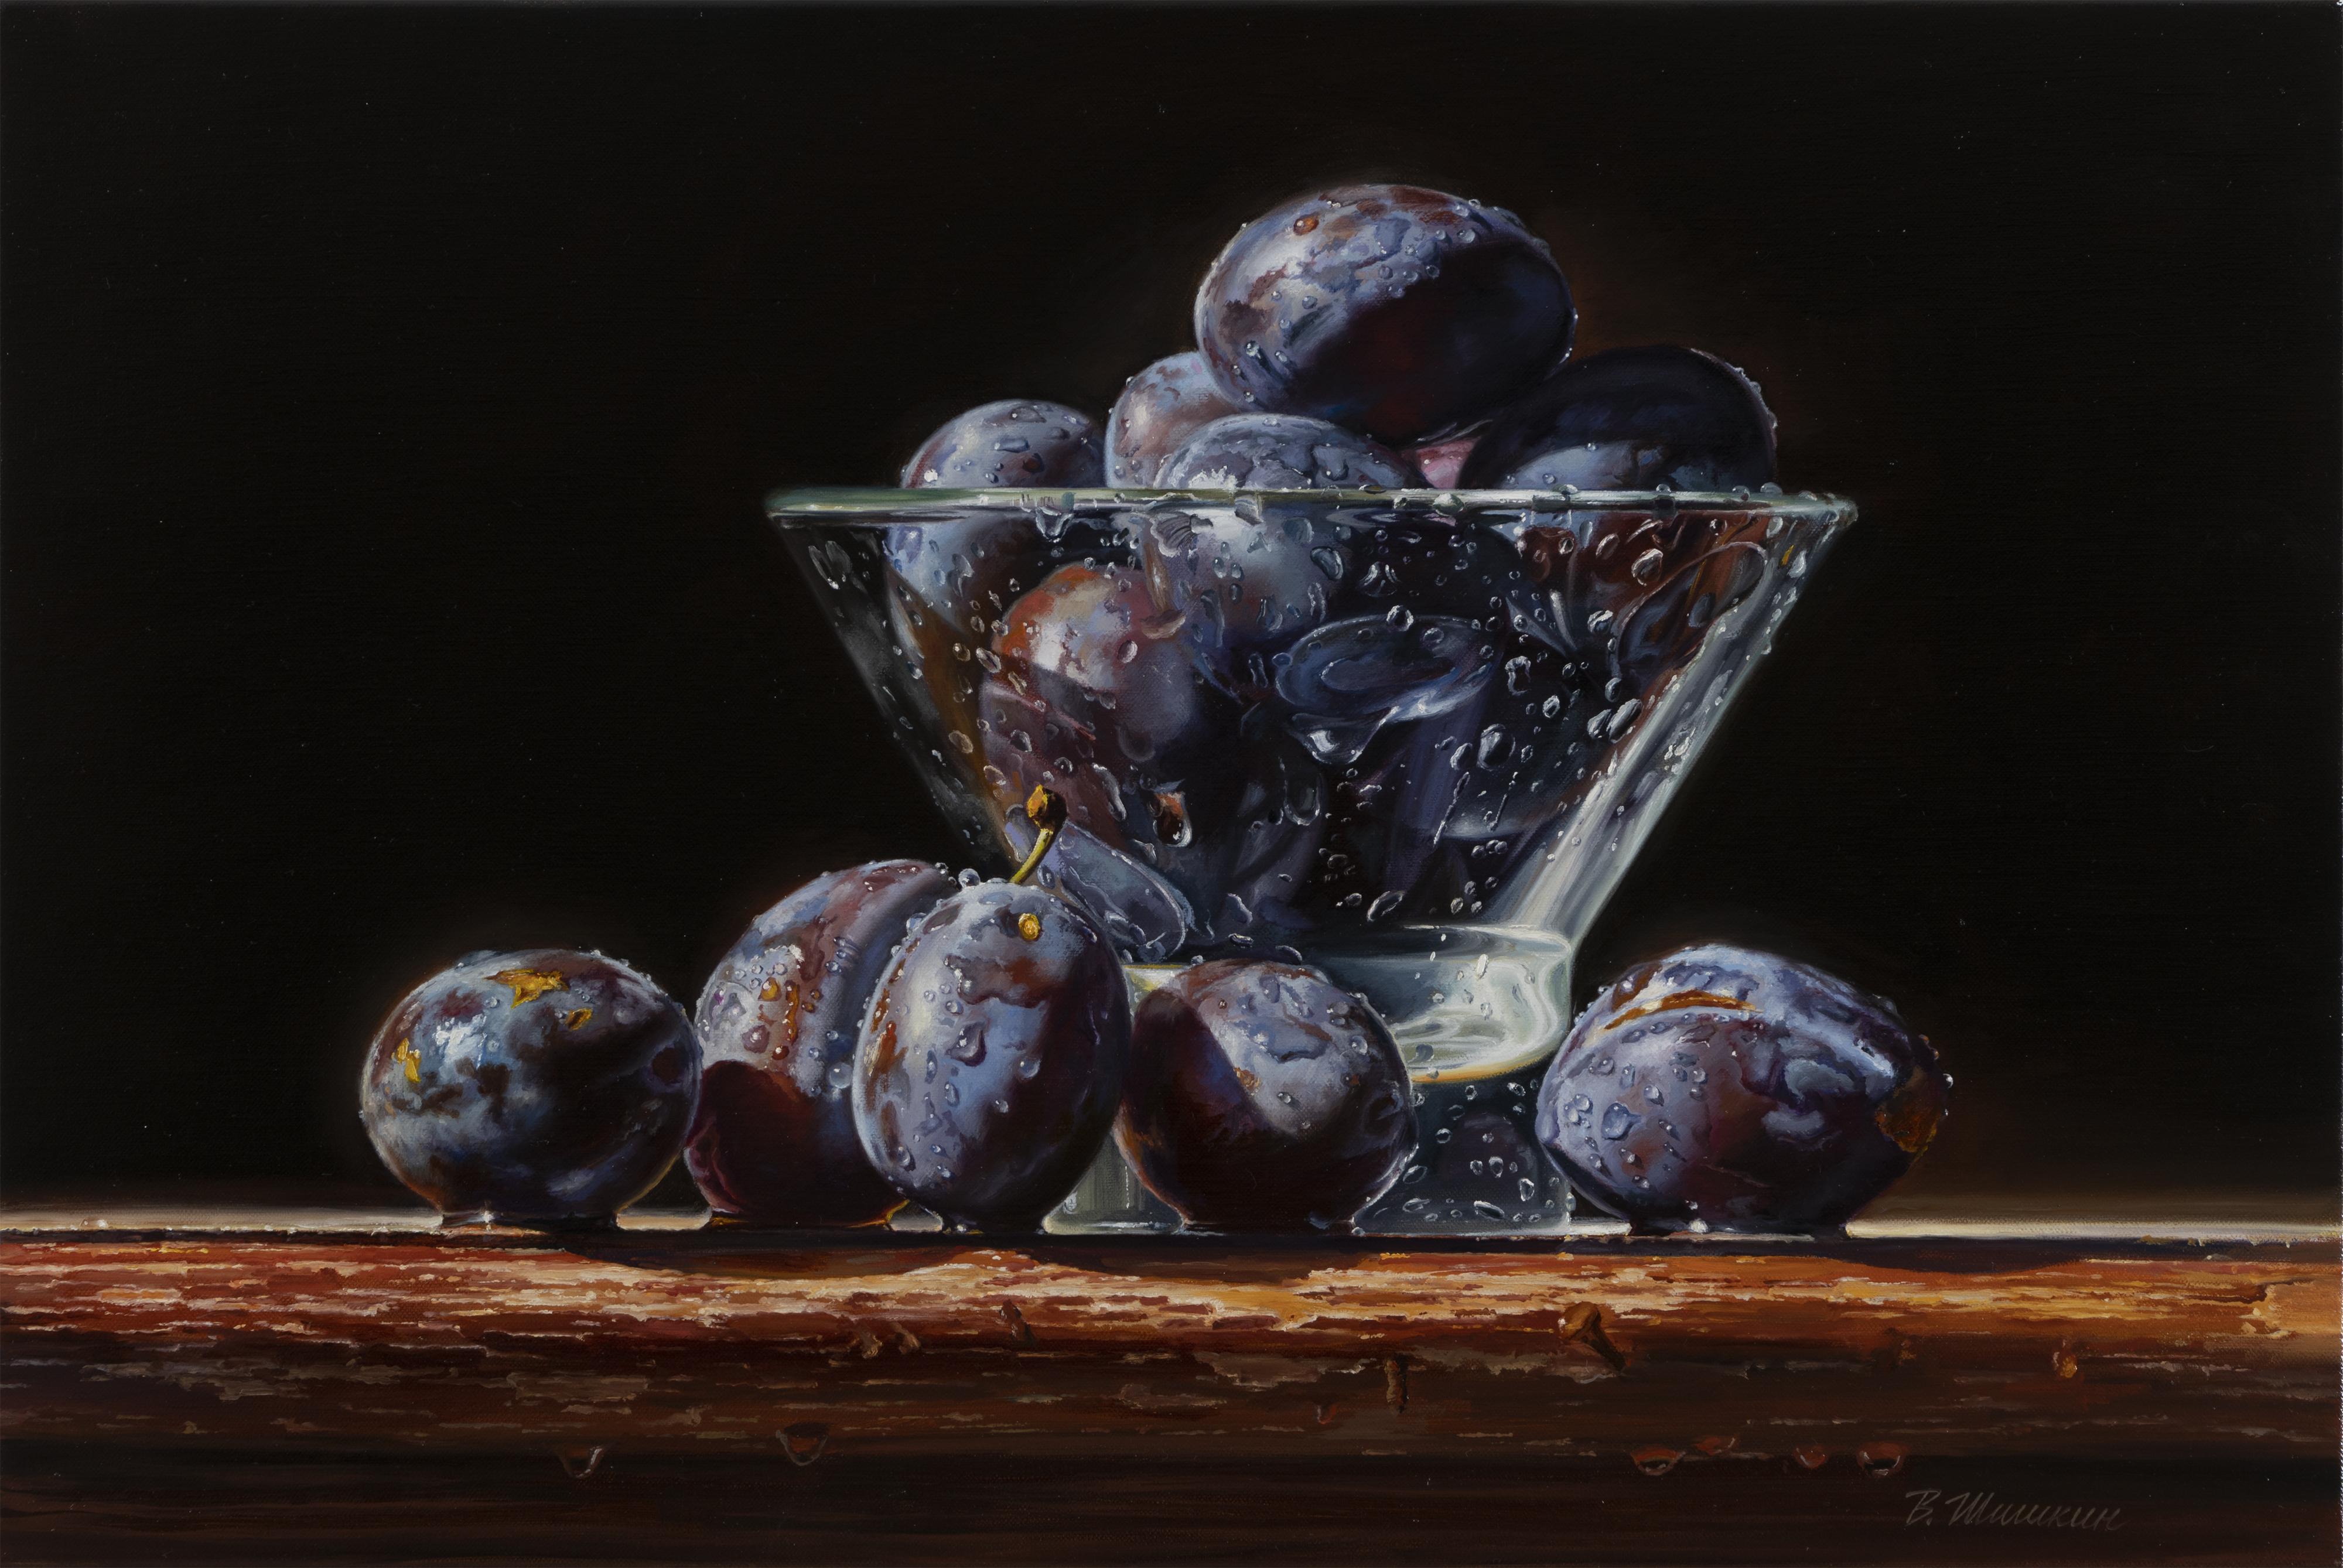 Wet plums